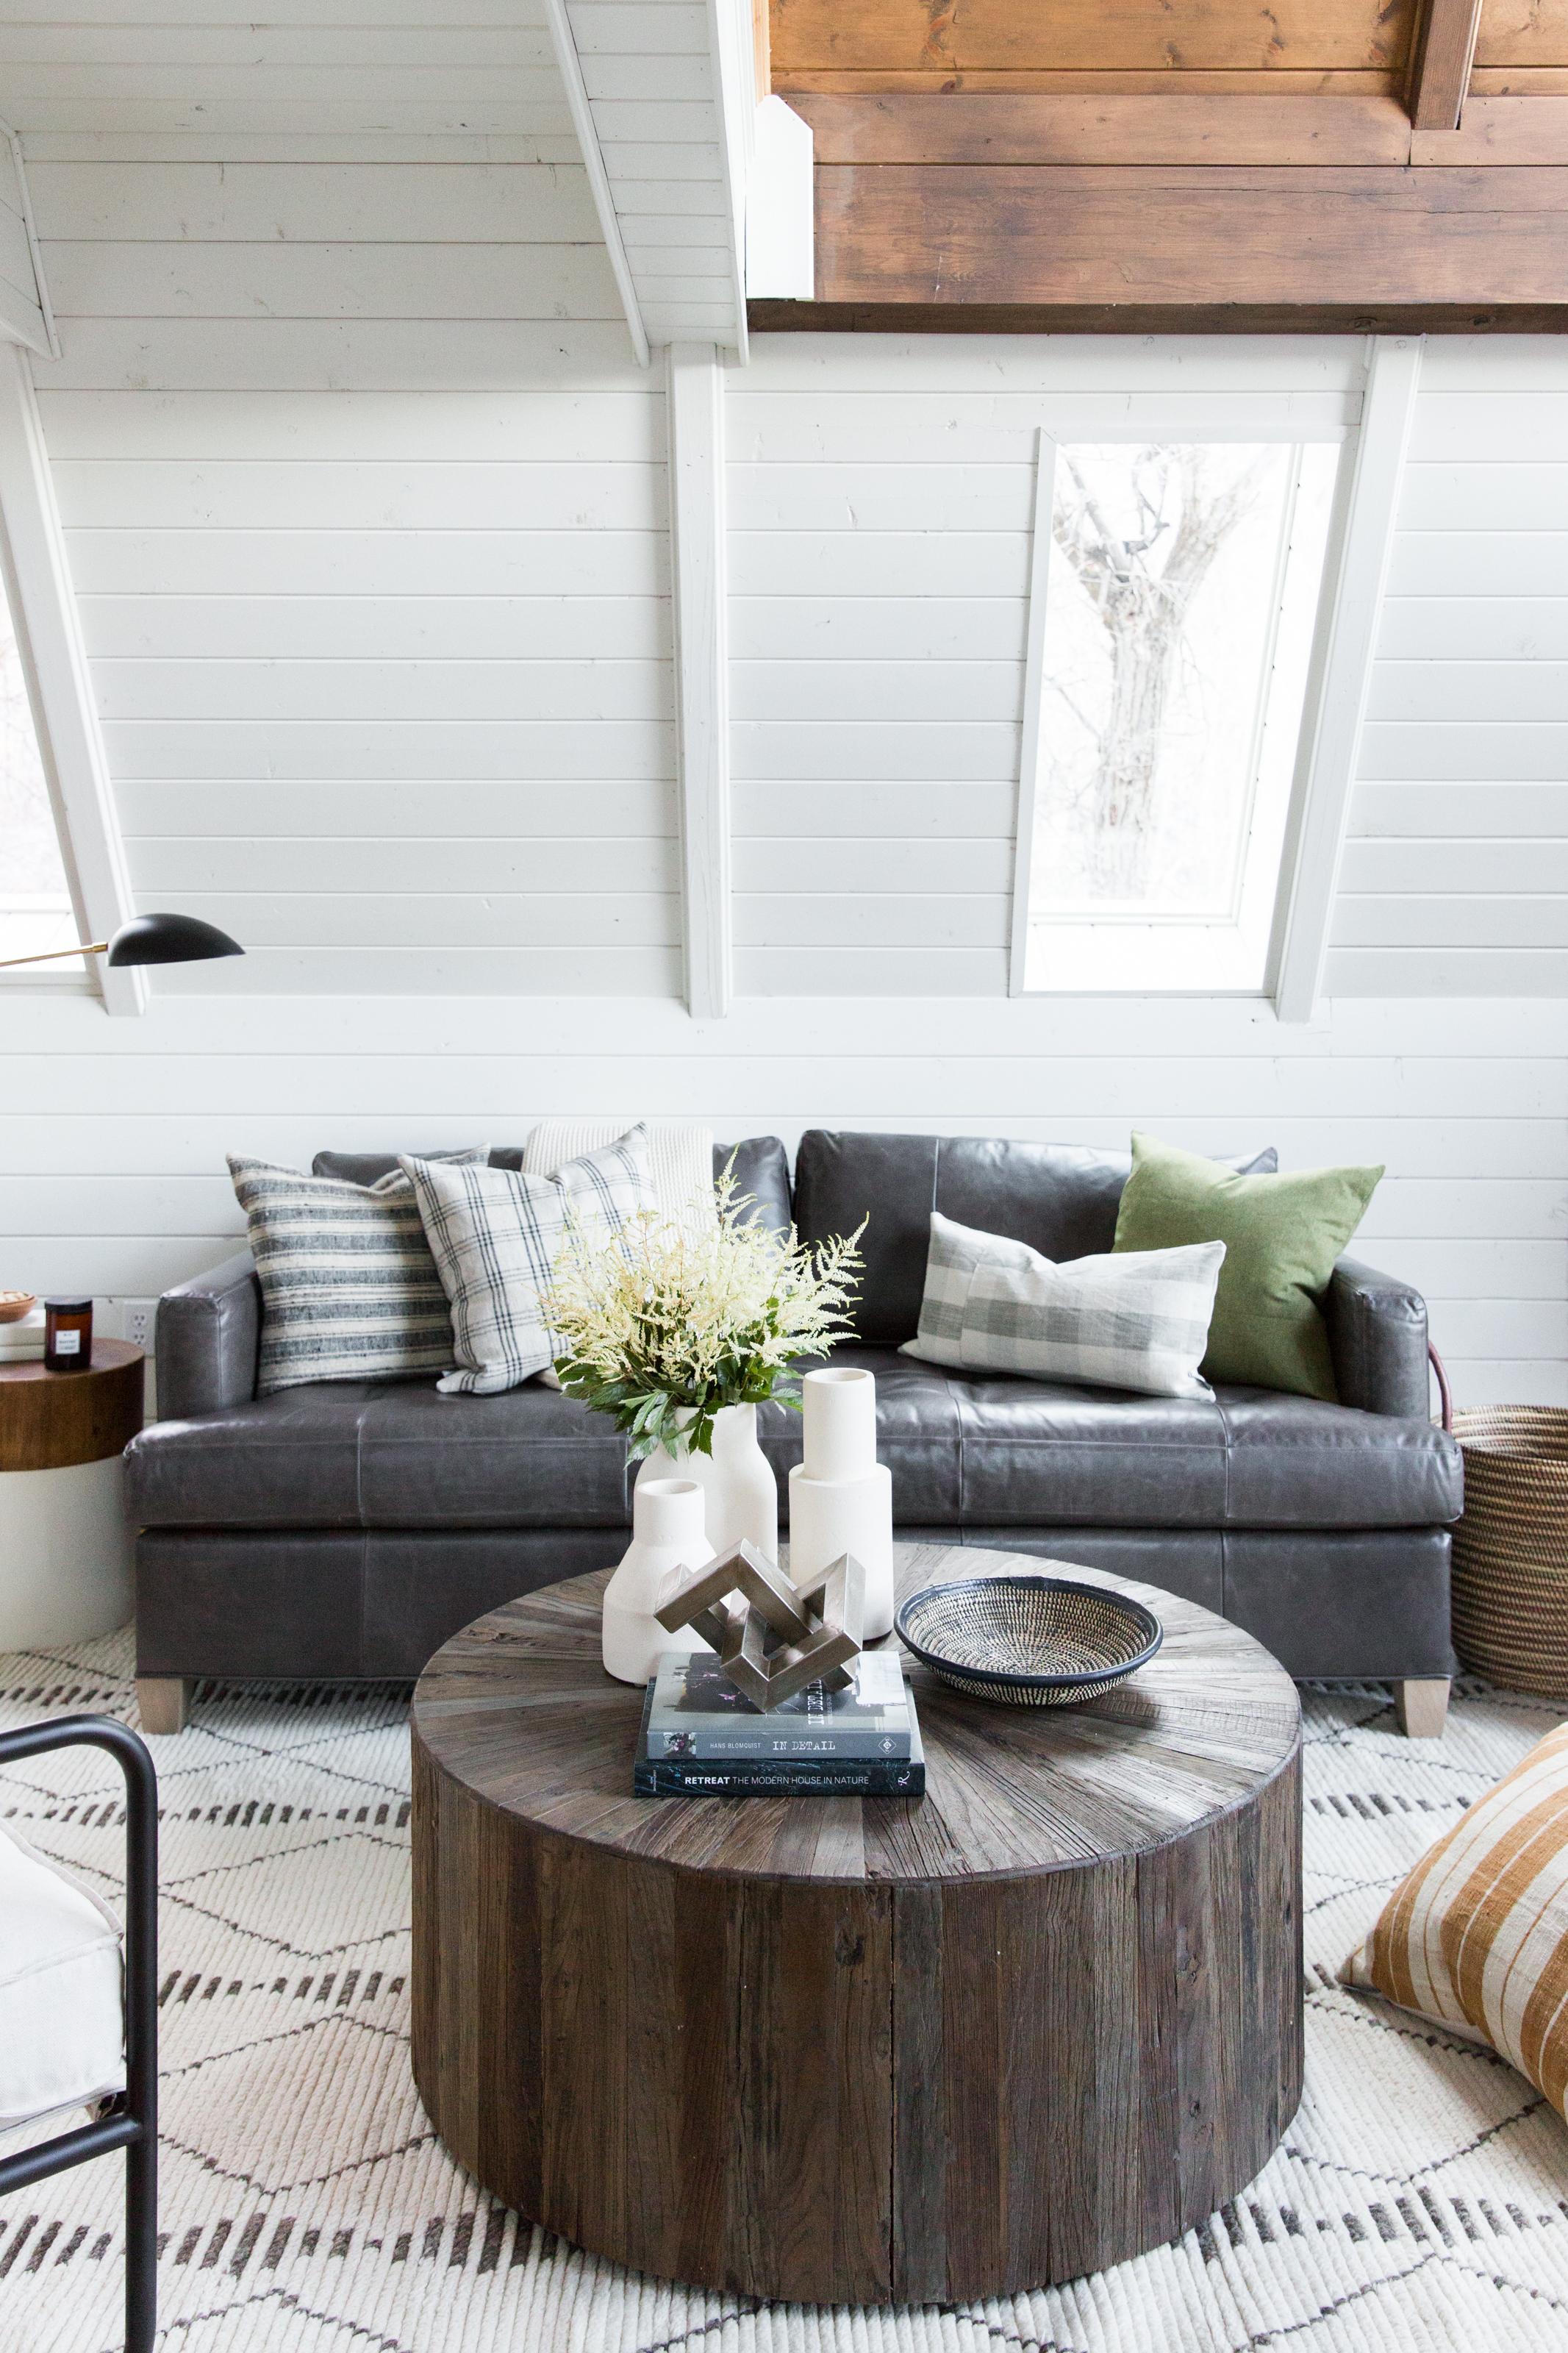 Homeware and Furniture